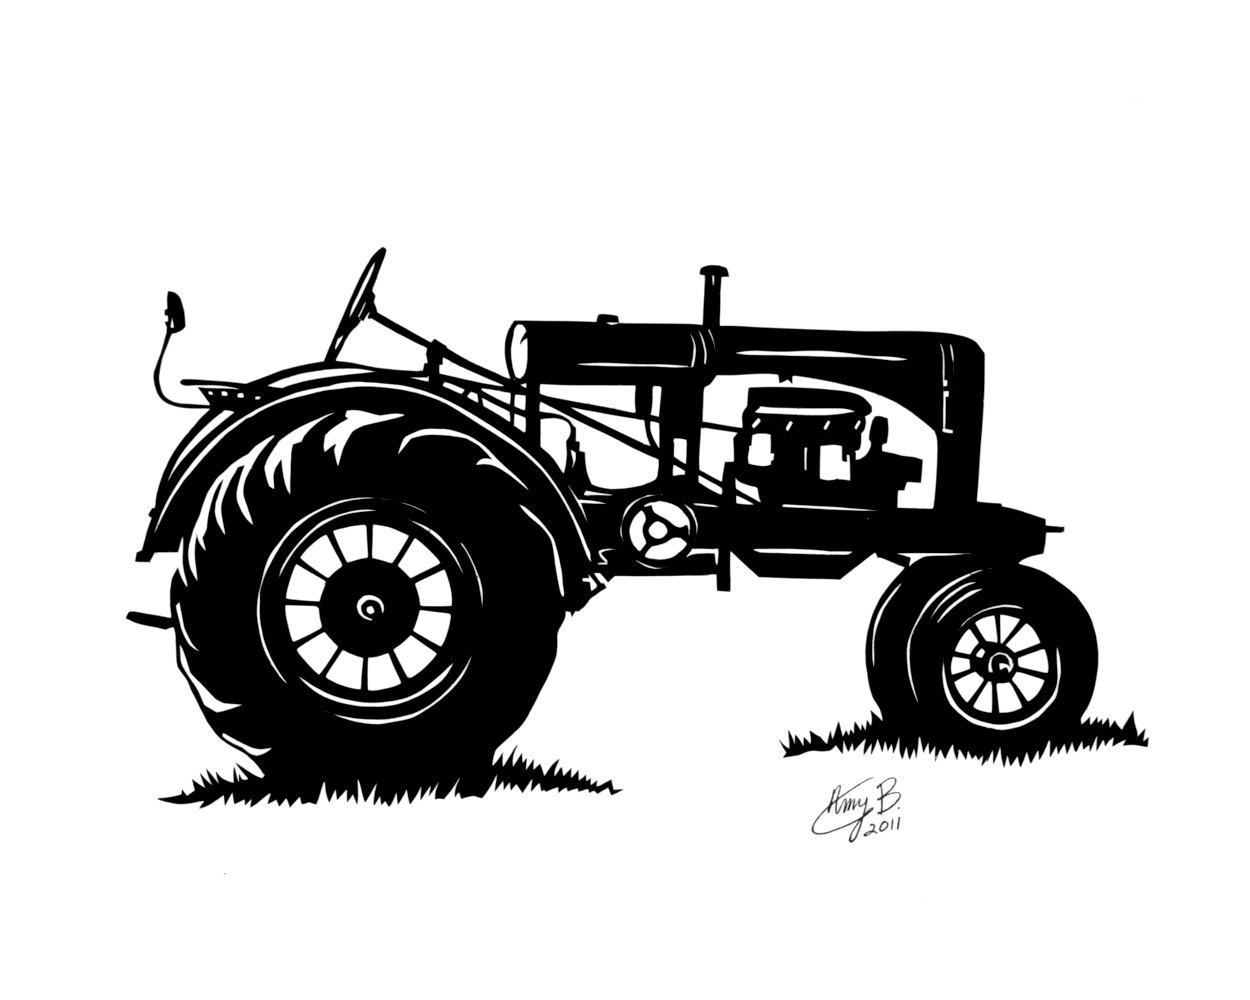 Antique john deere tractor clipart graphic transparent stock Free Antique Tractors Cliparts, Download Free Clip Art, Free Clip ... graphic transparent stock